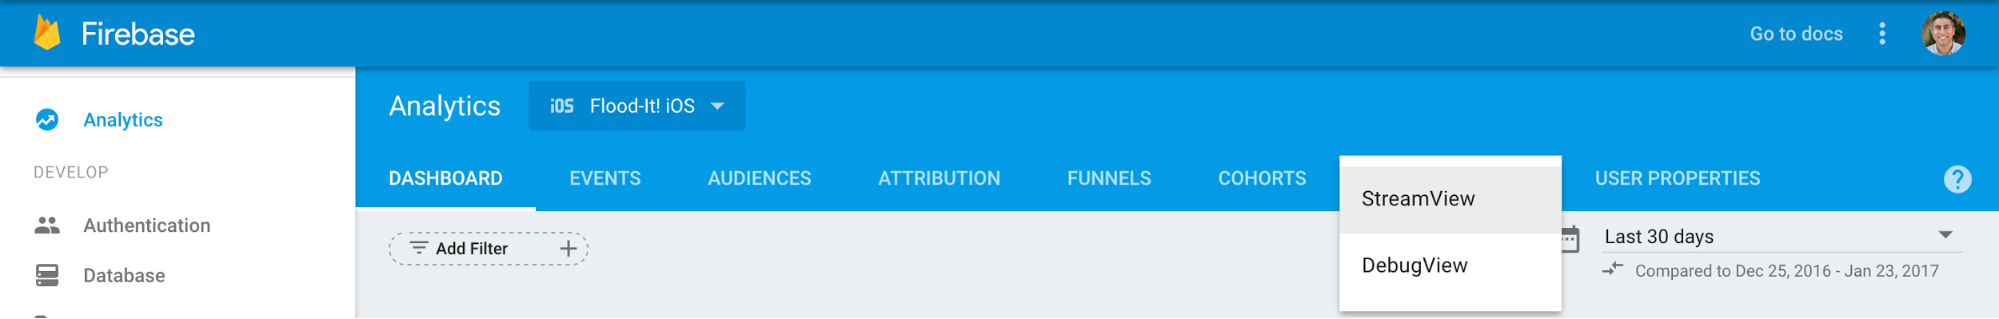 Firebase용 Google 애널리틱스의 상단 탐색 메뉴에서 StreamView 옆의 화살표를 클릭하고 DebugView를 선택하여 DebugView로 이동